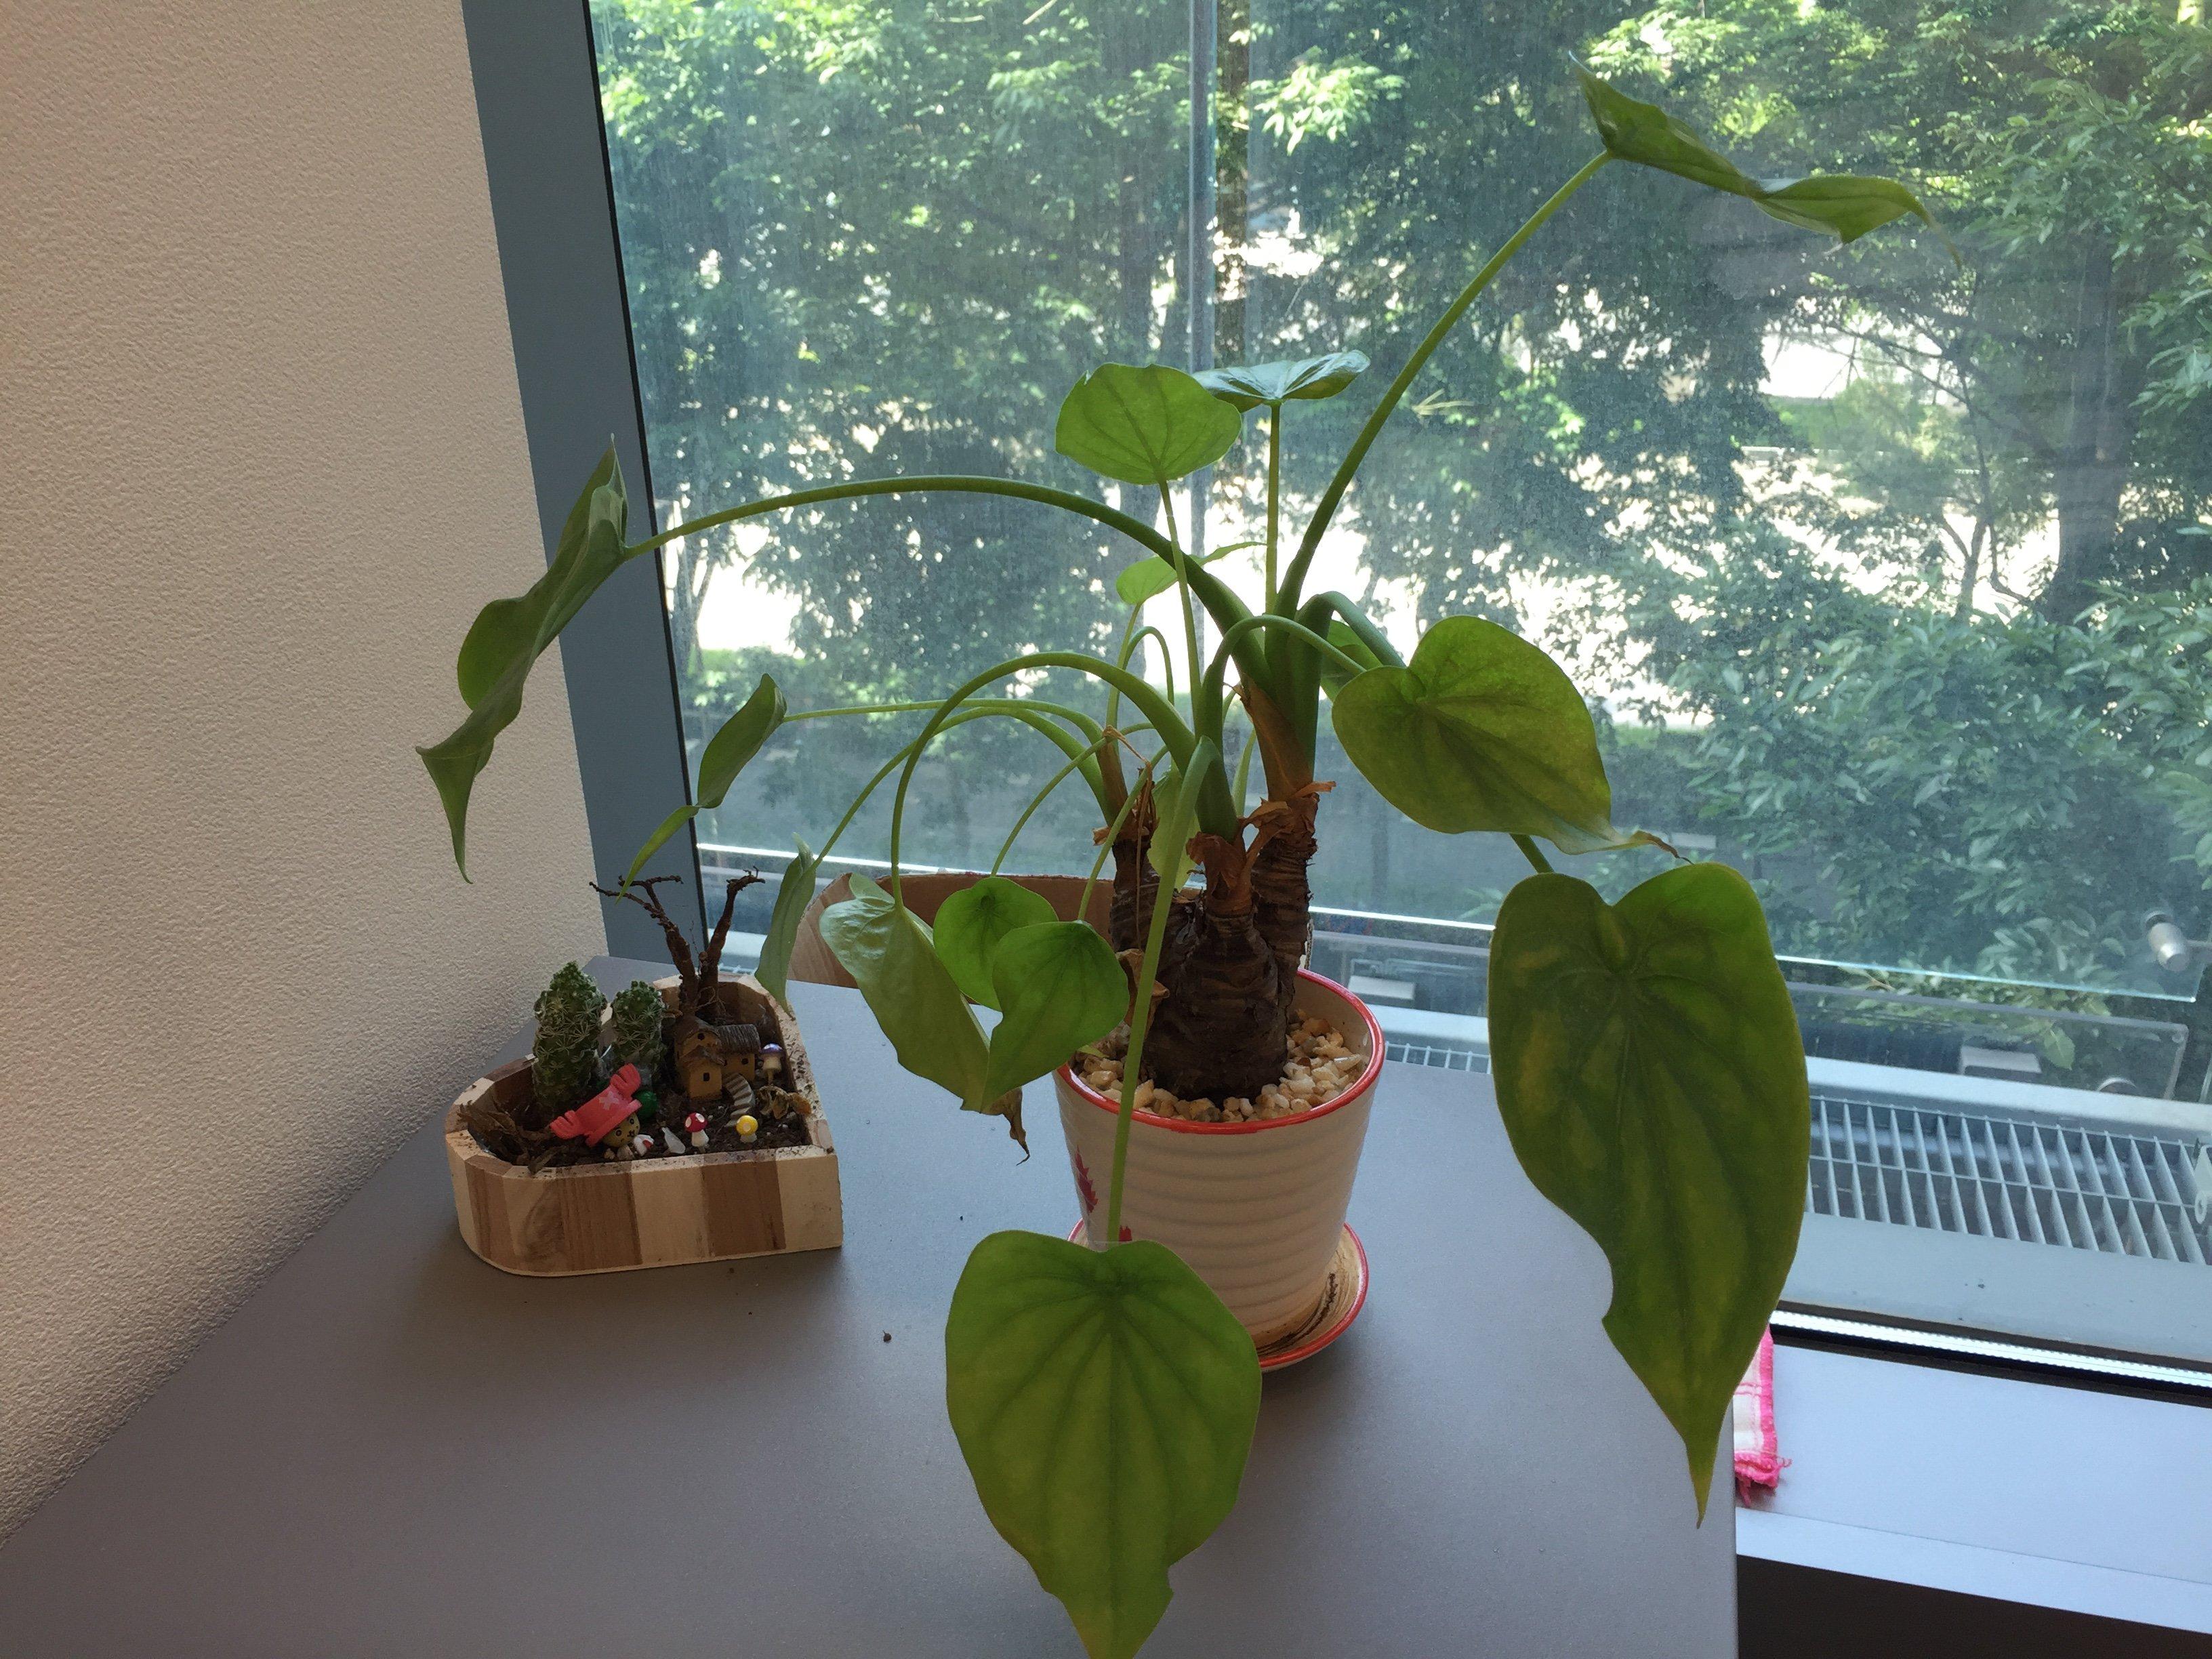 Office-Plant-2015-09-29.jpg